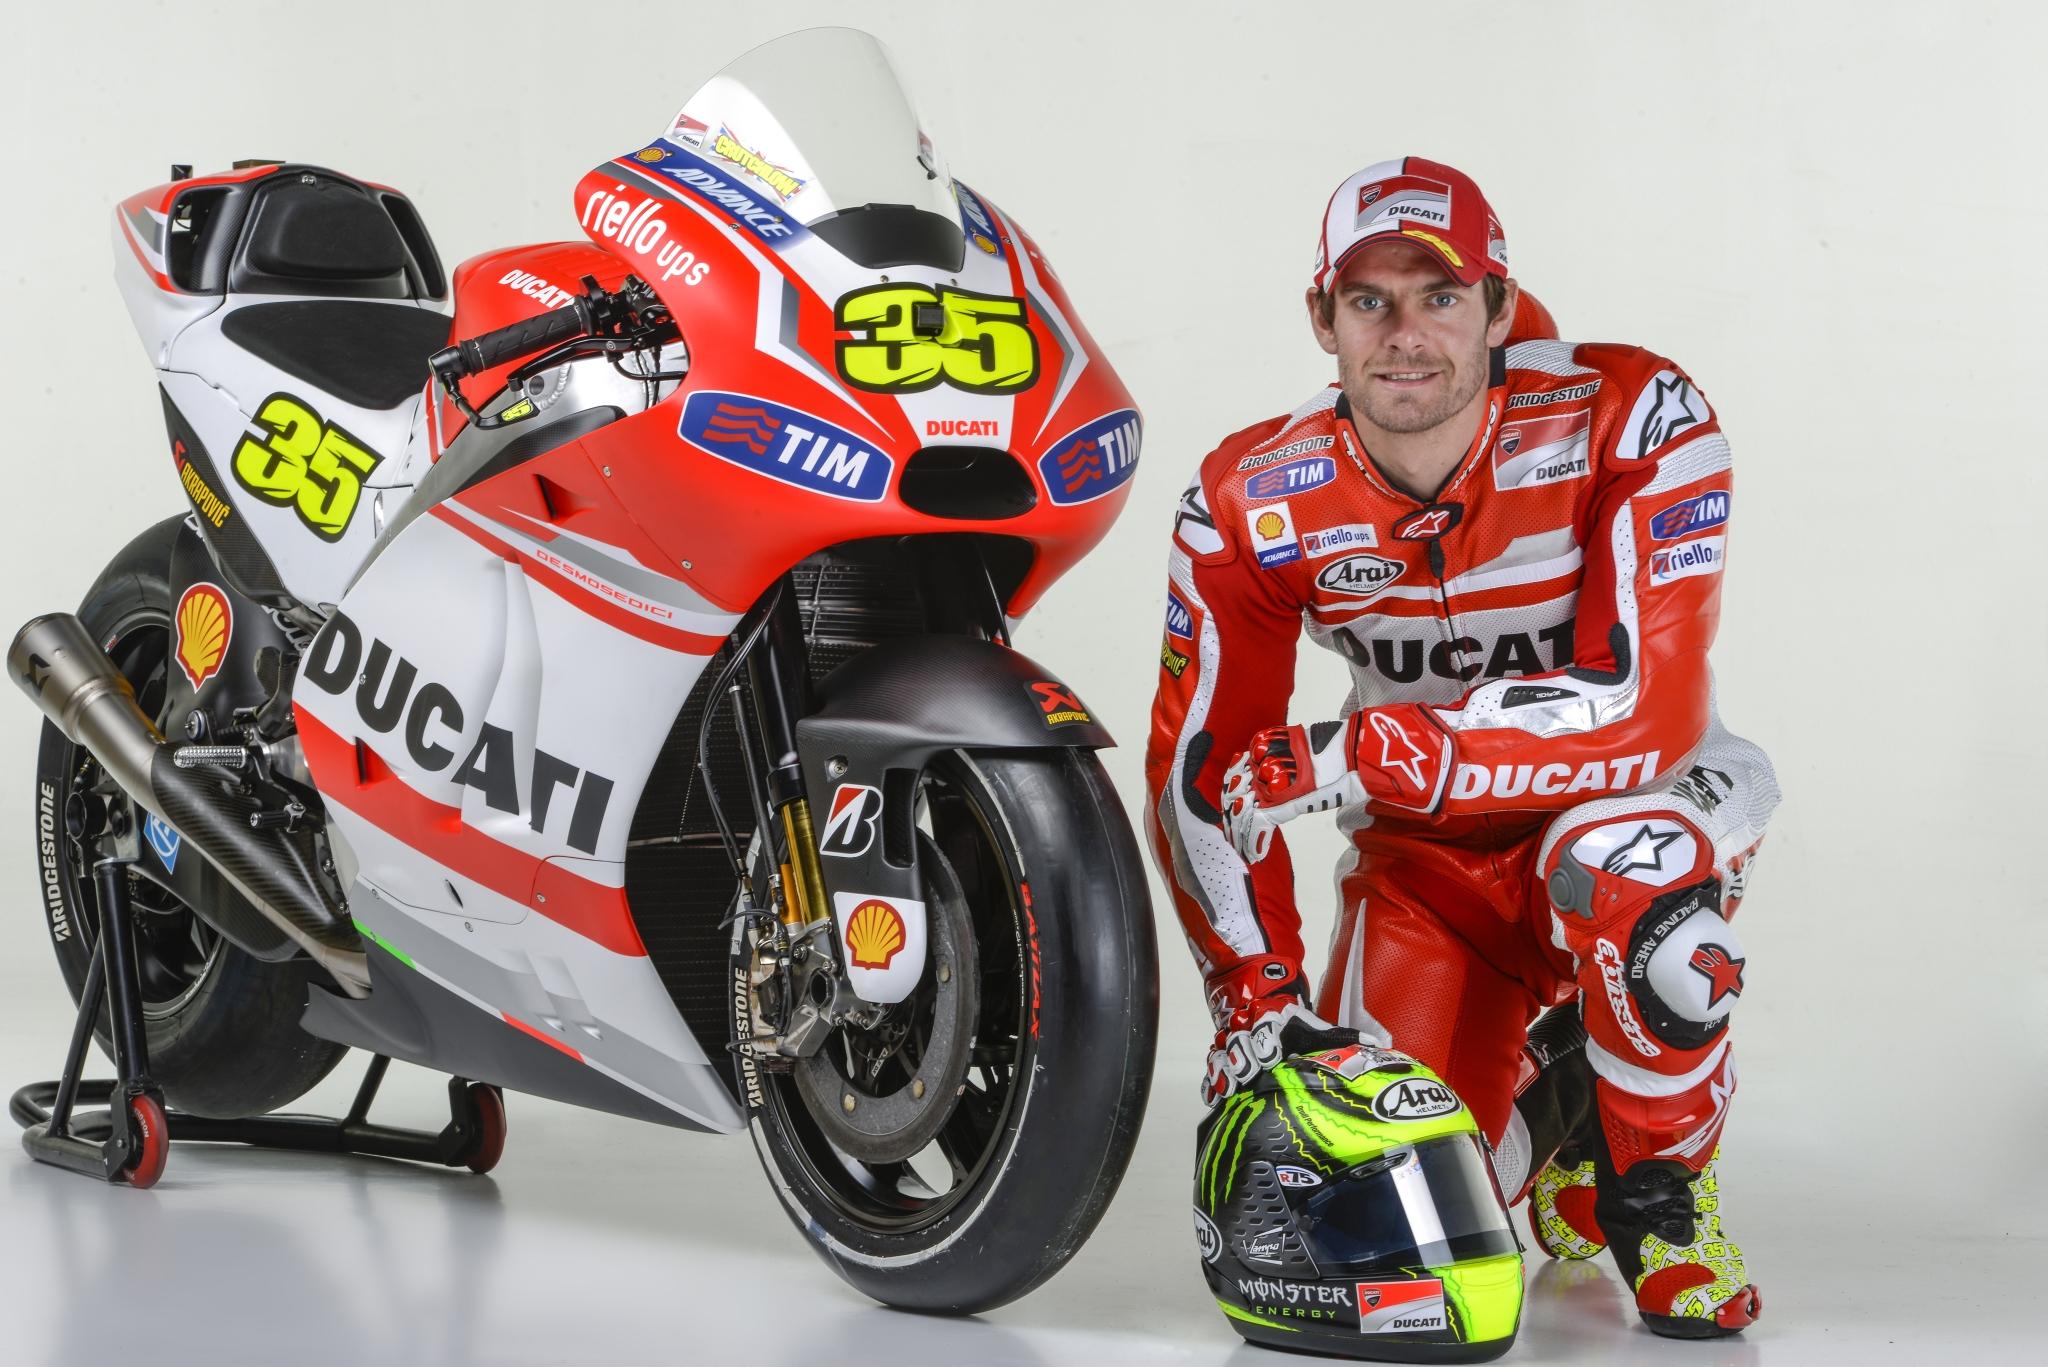 2014 Ducati MotoGP Bikes in Sizzling Hot Pictorial - autoevolution